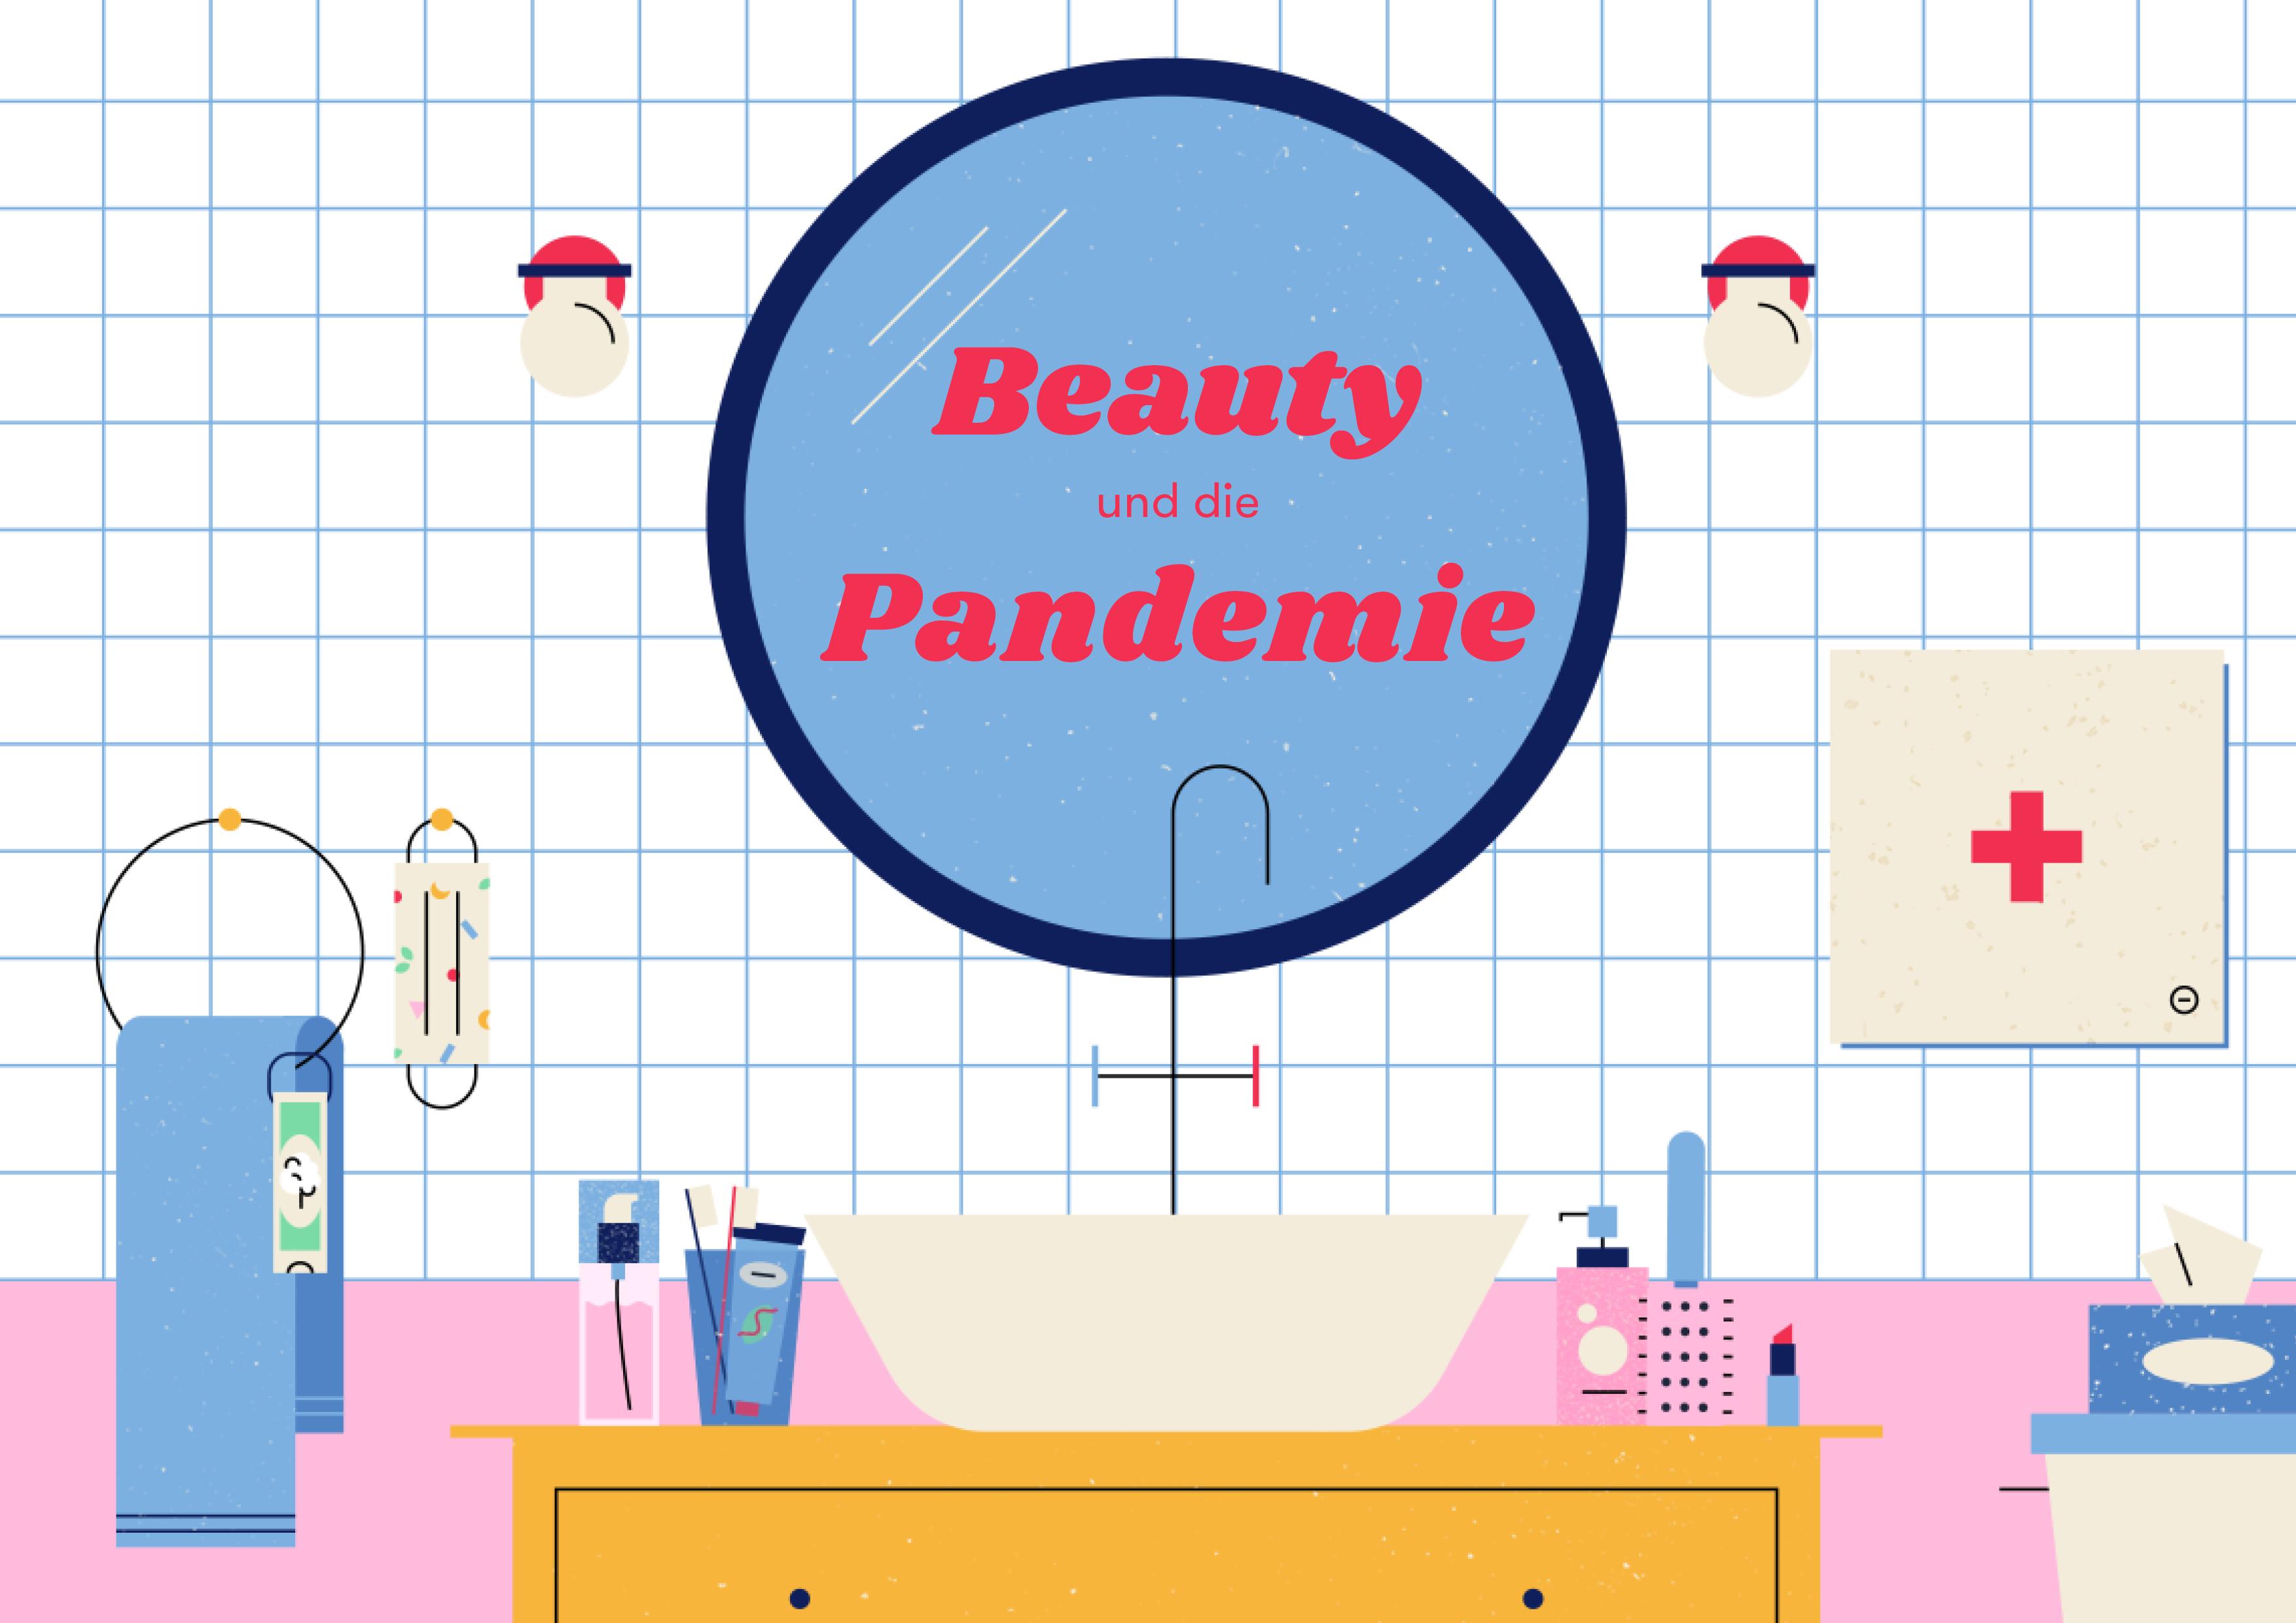 Beauty in der Pandemie